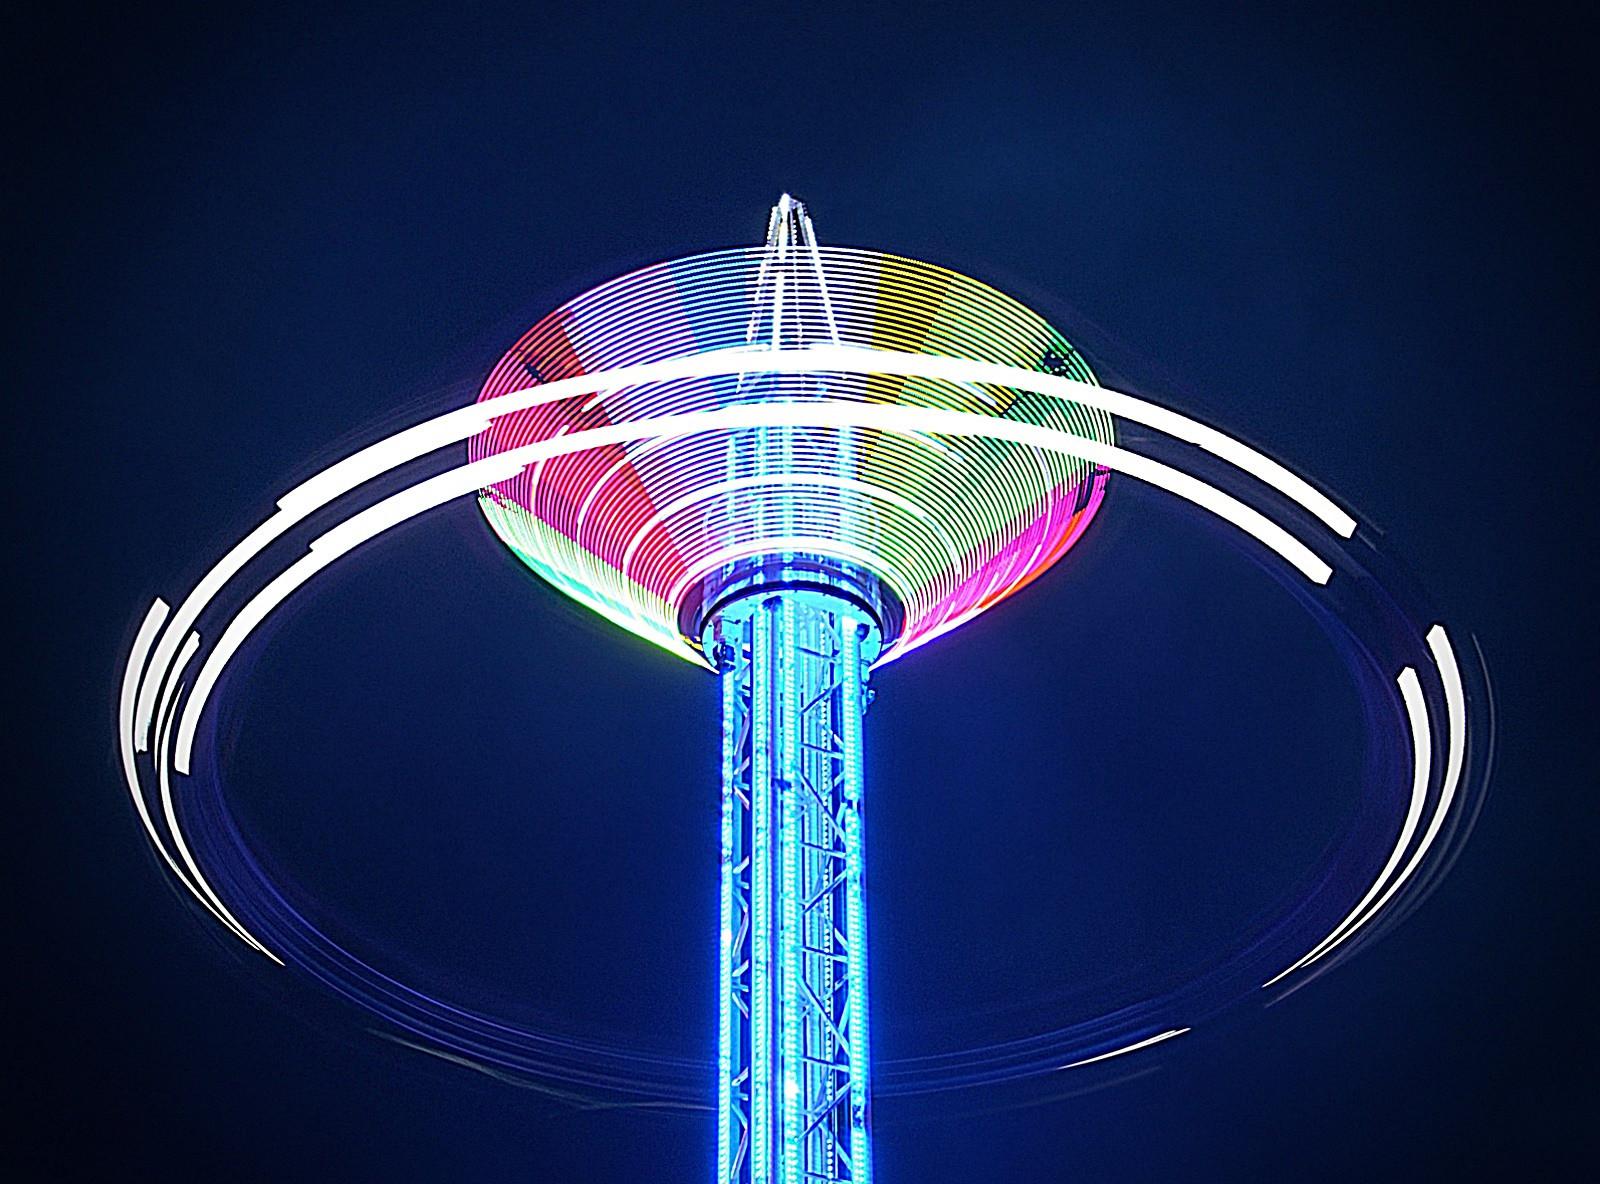 PDI - Spinning Around - Kylie Minogue by Caroline Johnston (11 marks)